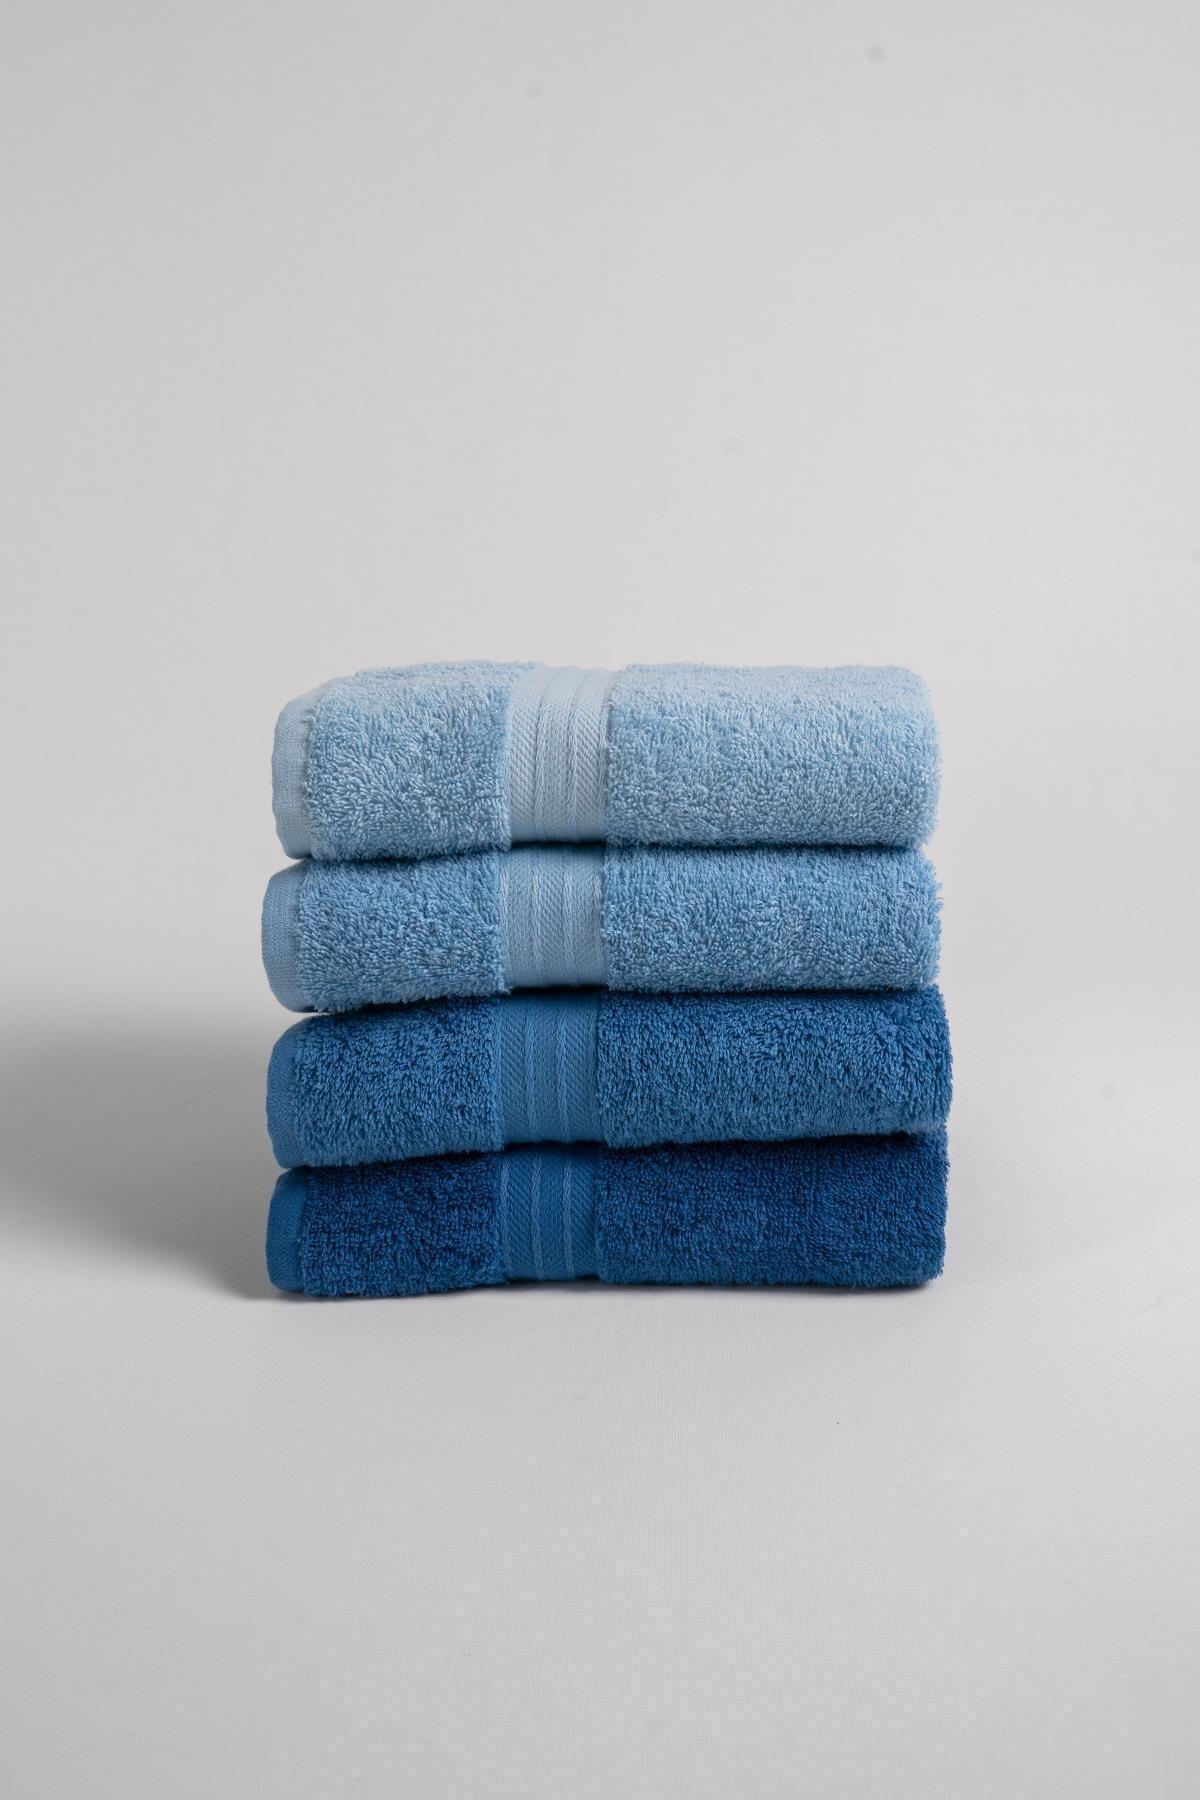 Rainbow %100 Pamuk Ekstra Yumuşak Mavi Tonlar 4'lü El/Yüz Havlu Seti(4*50x80)